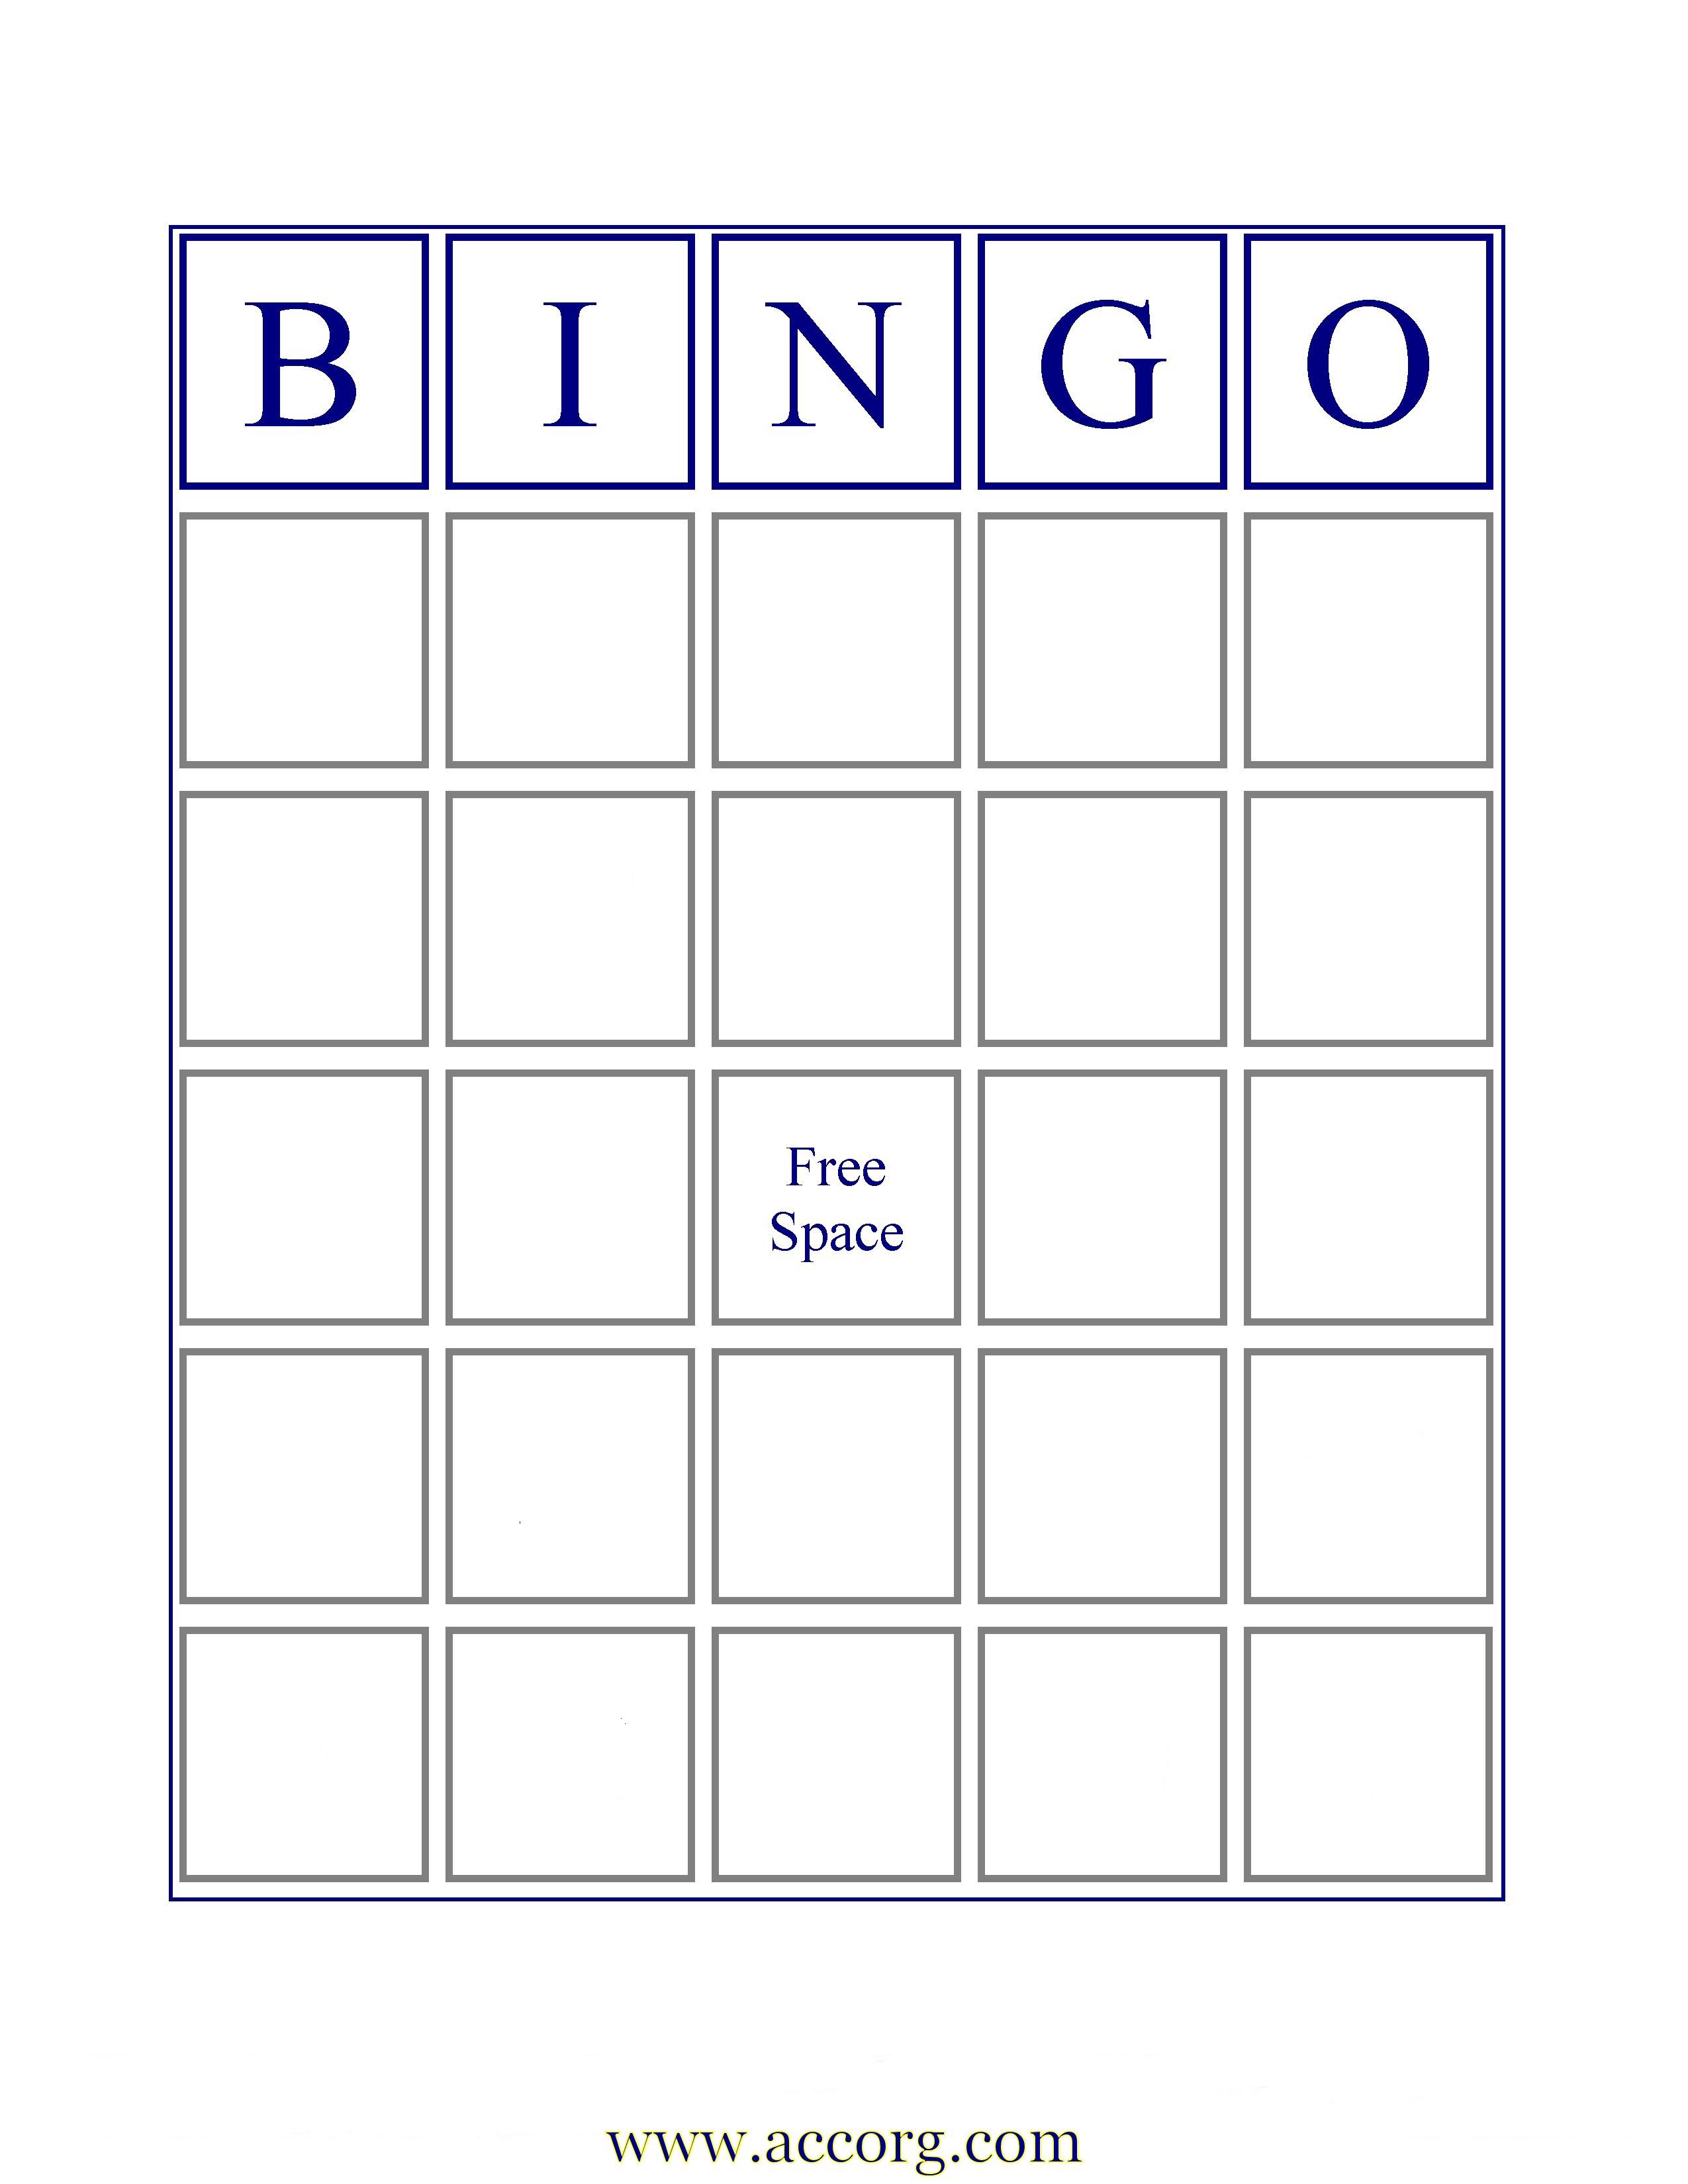 6 Images of Empty Bingo Cards Printables